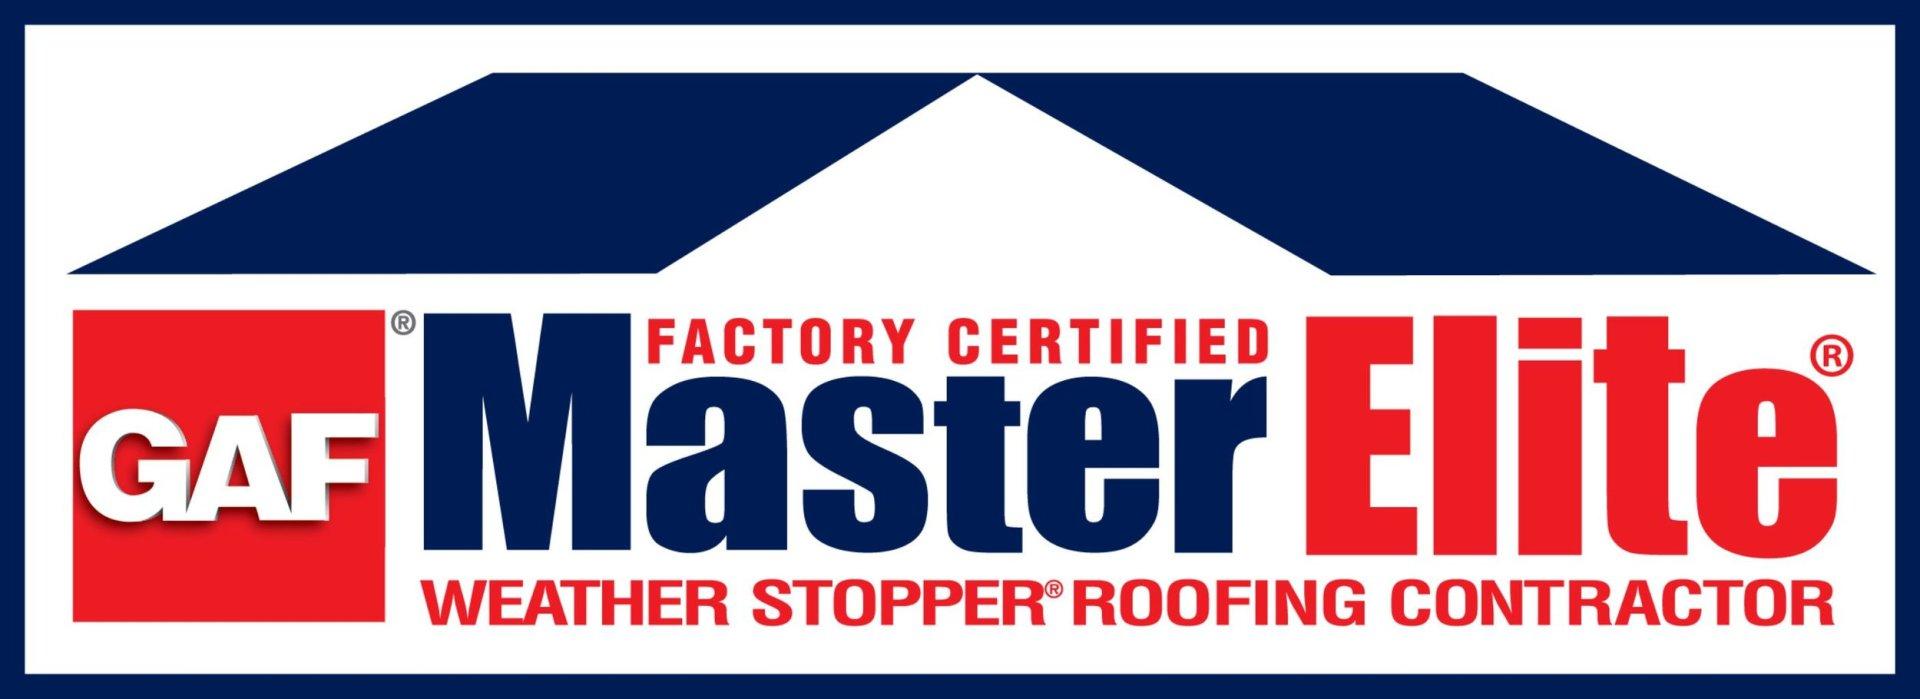 Gaf Master Elite Certification What Does It Mean